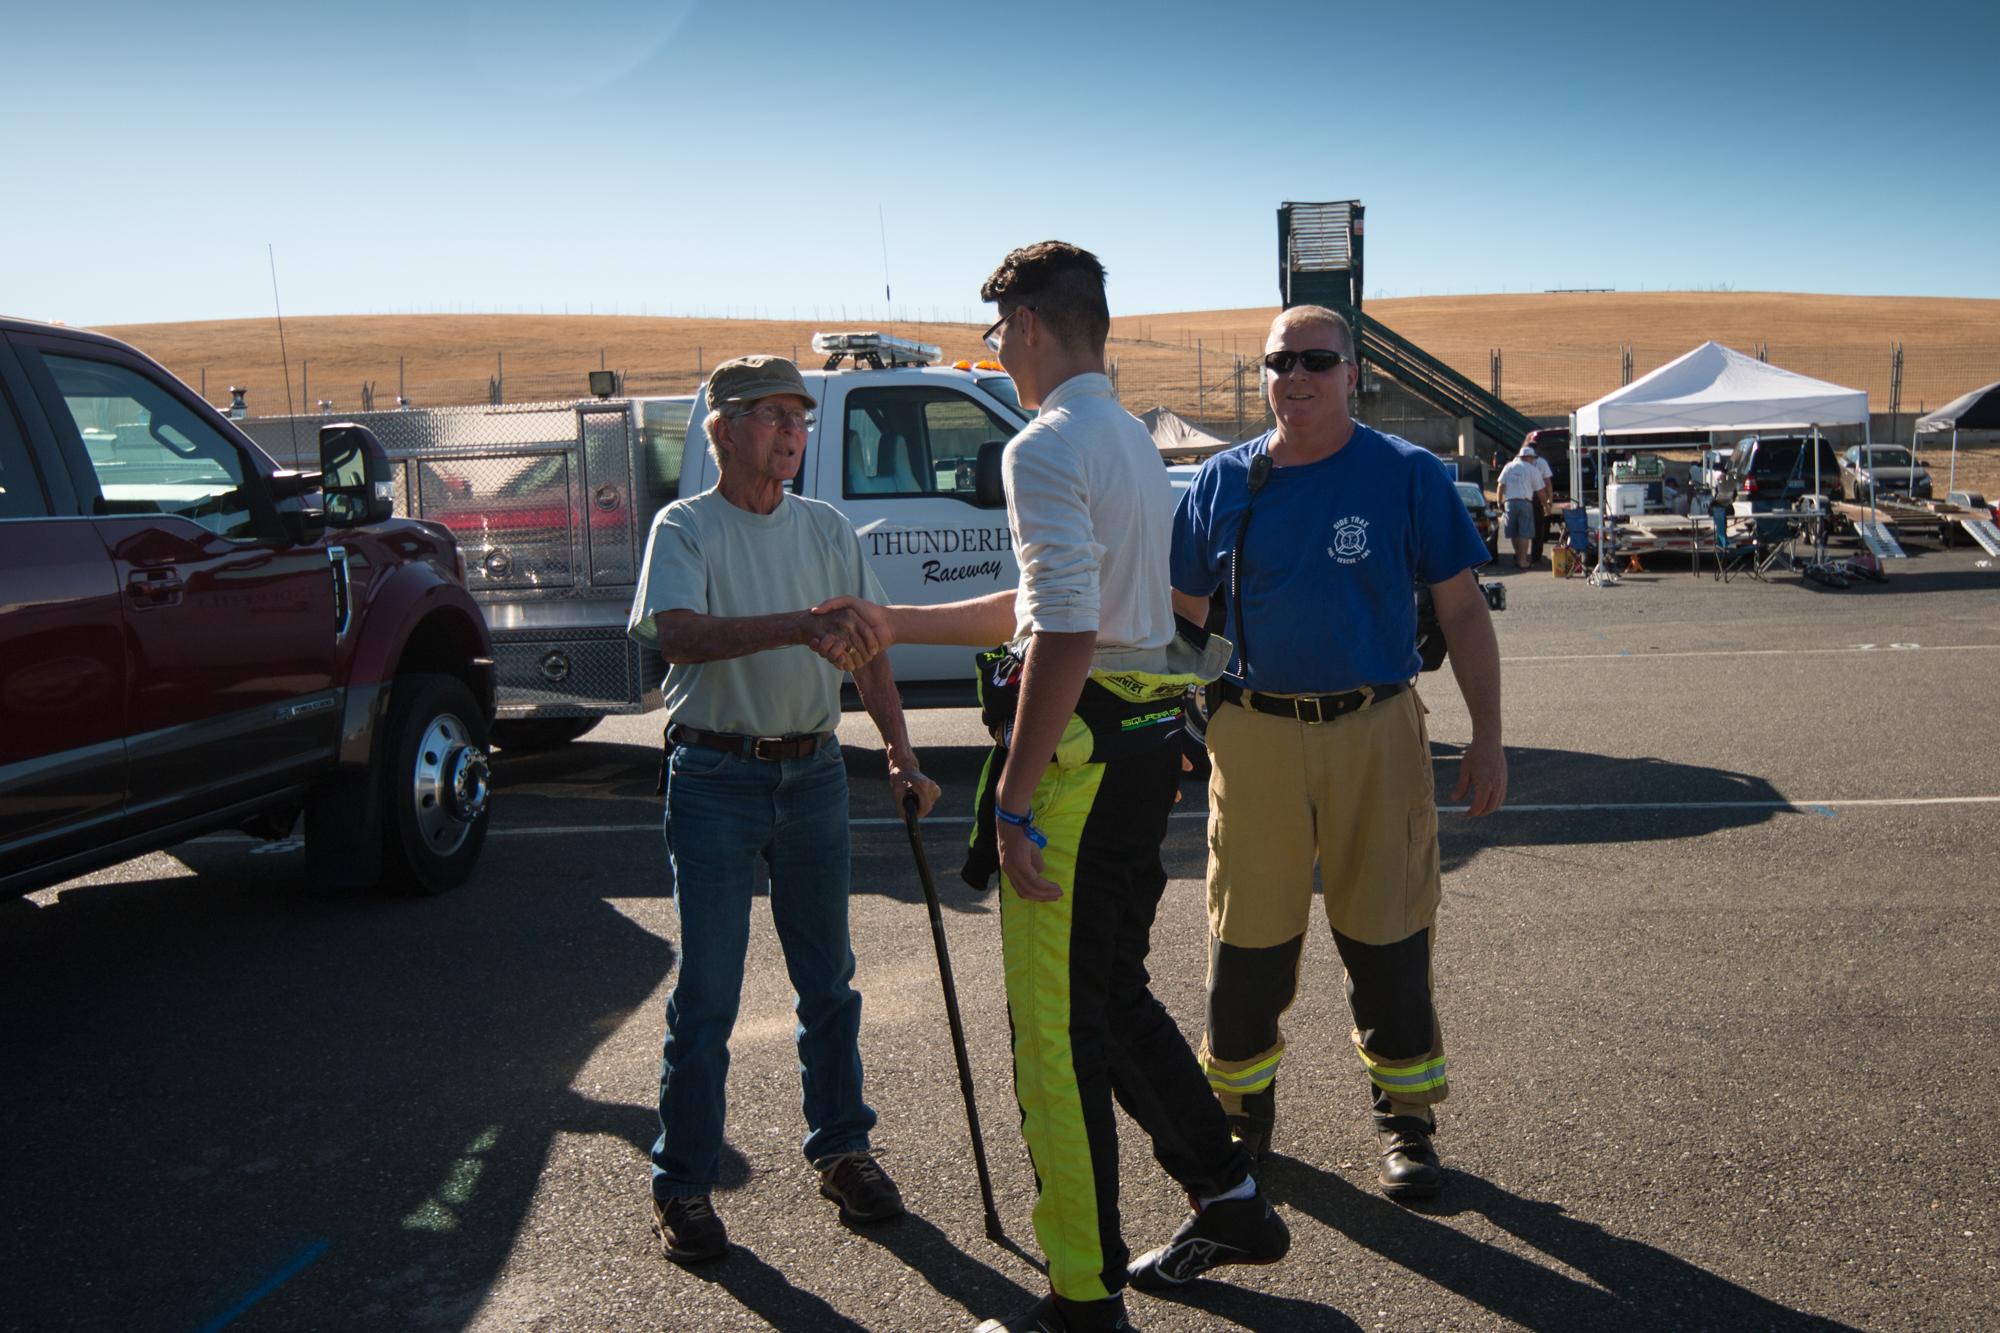 Steven-Racing-20130206-44861.jpg